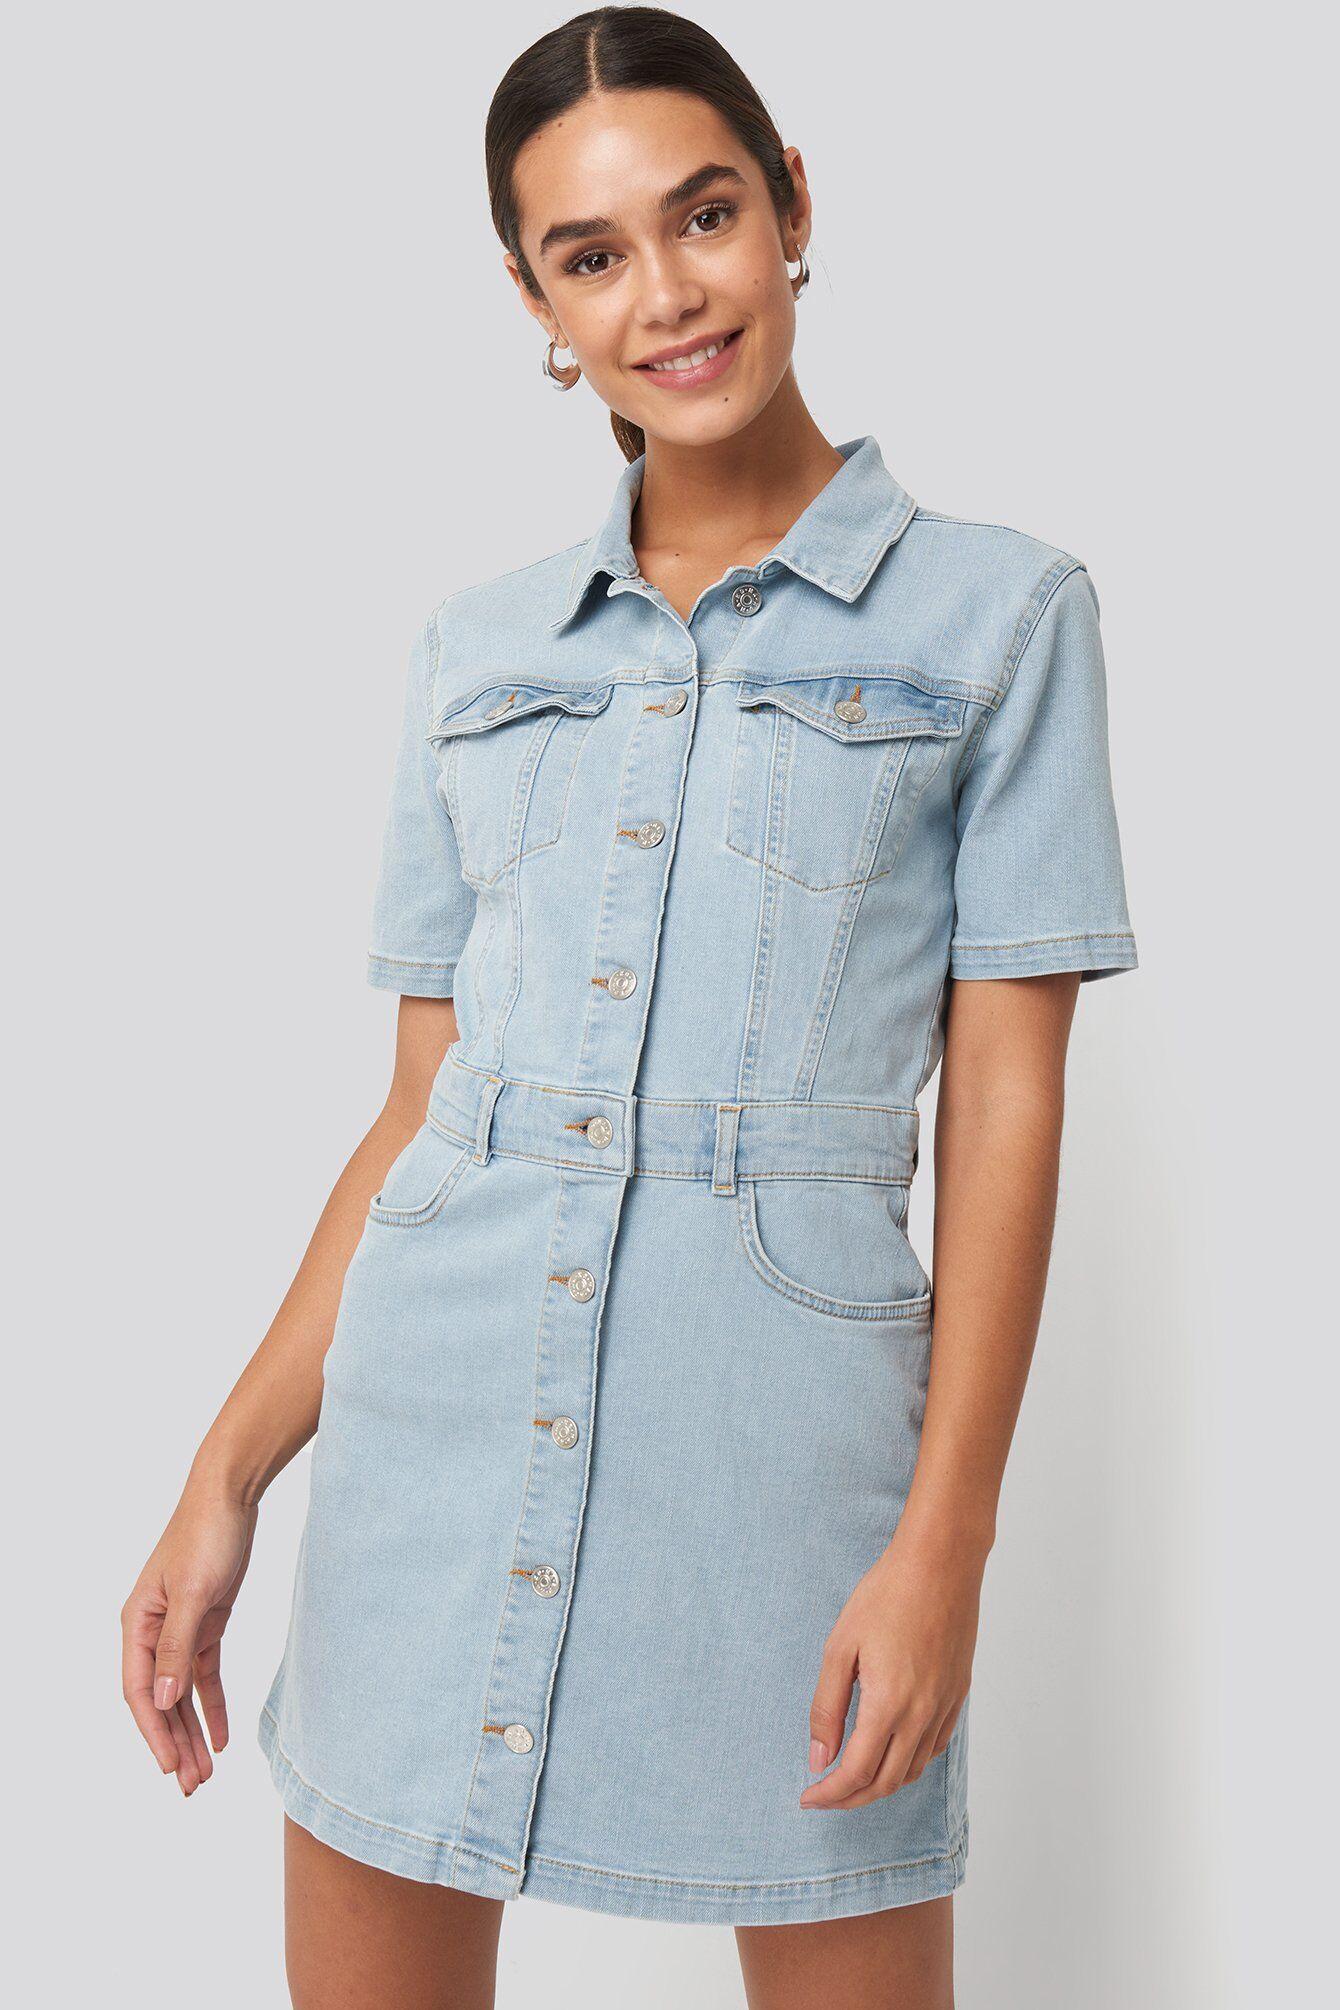 NA-KD Button Up Mini Denim Dress - Blue